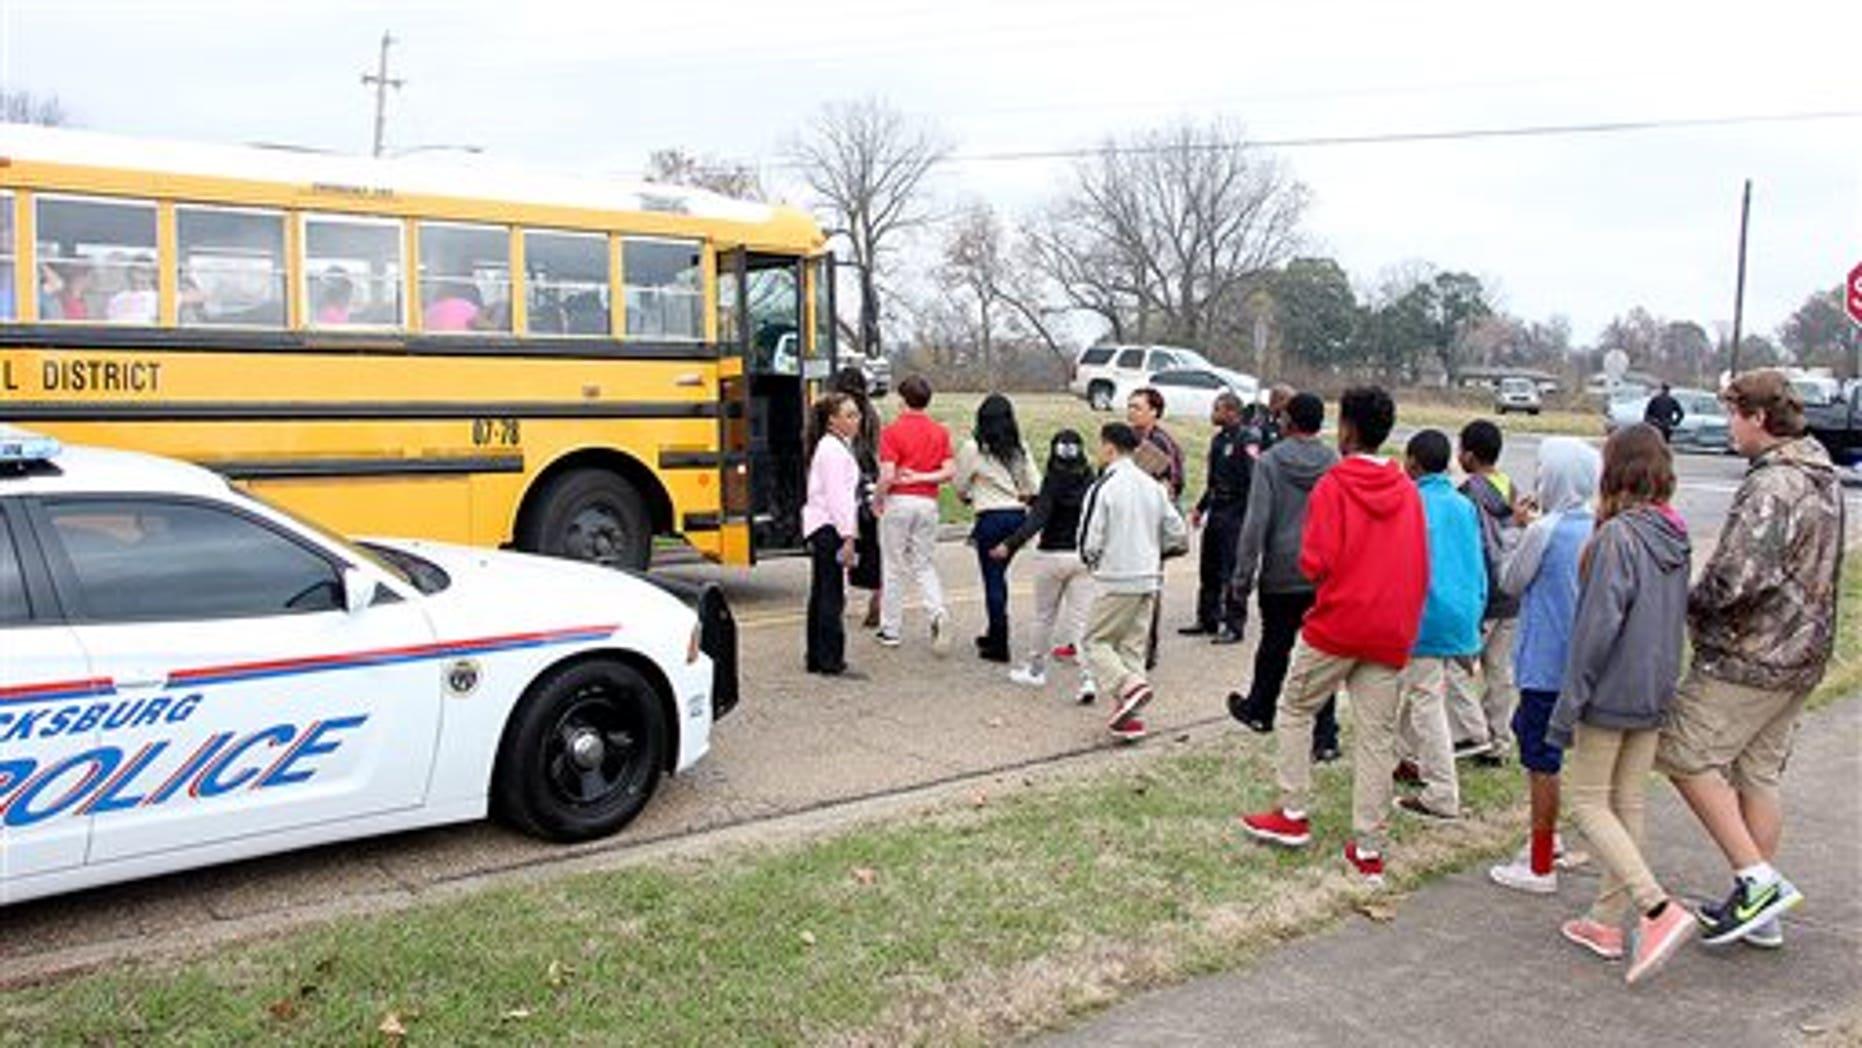 Warren Central Junior High School was evacuated Wednesday.